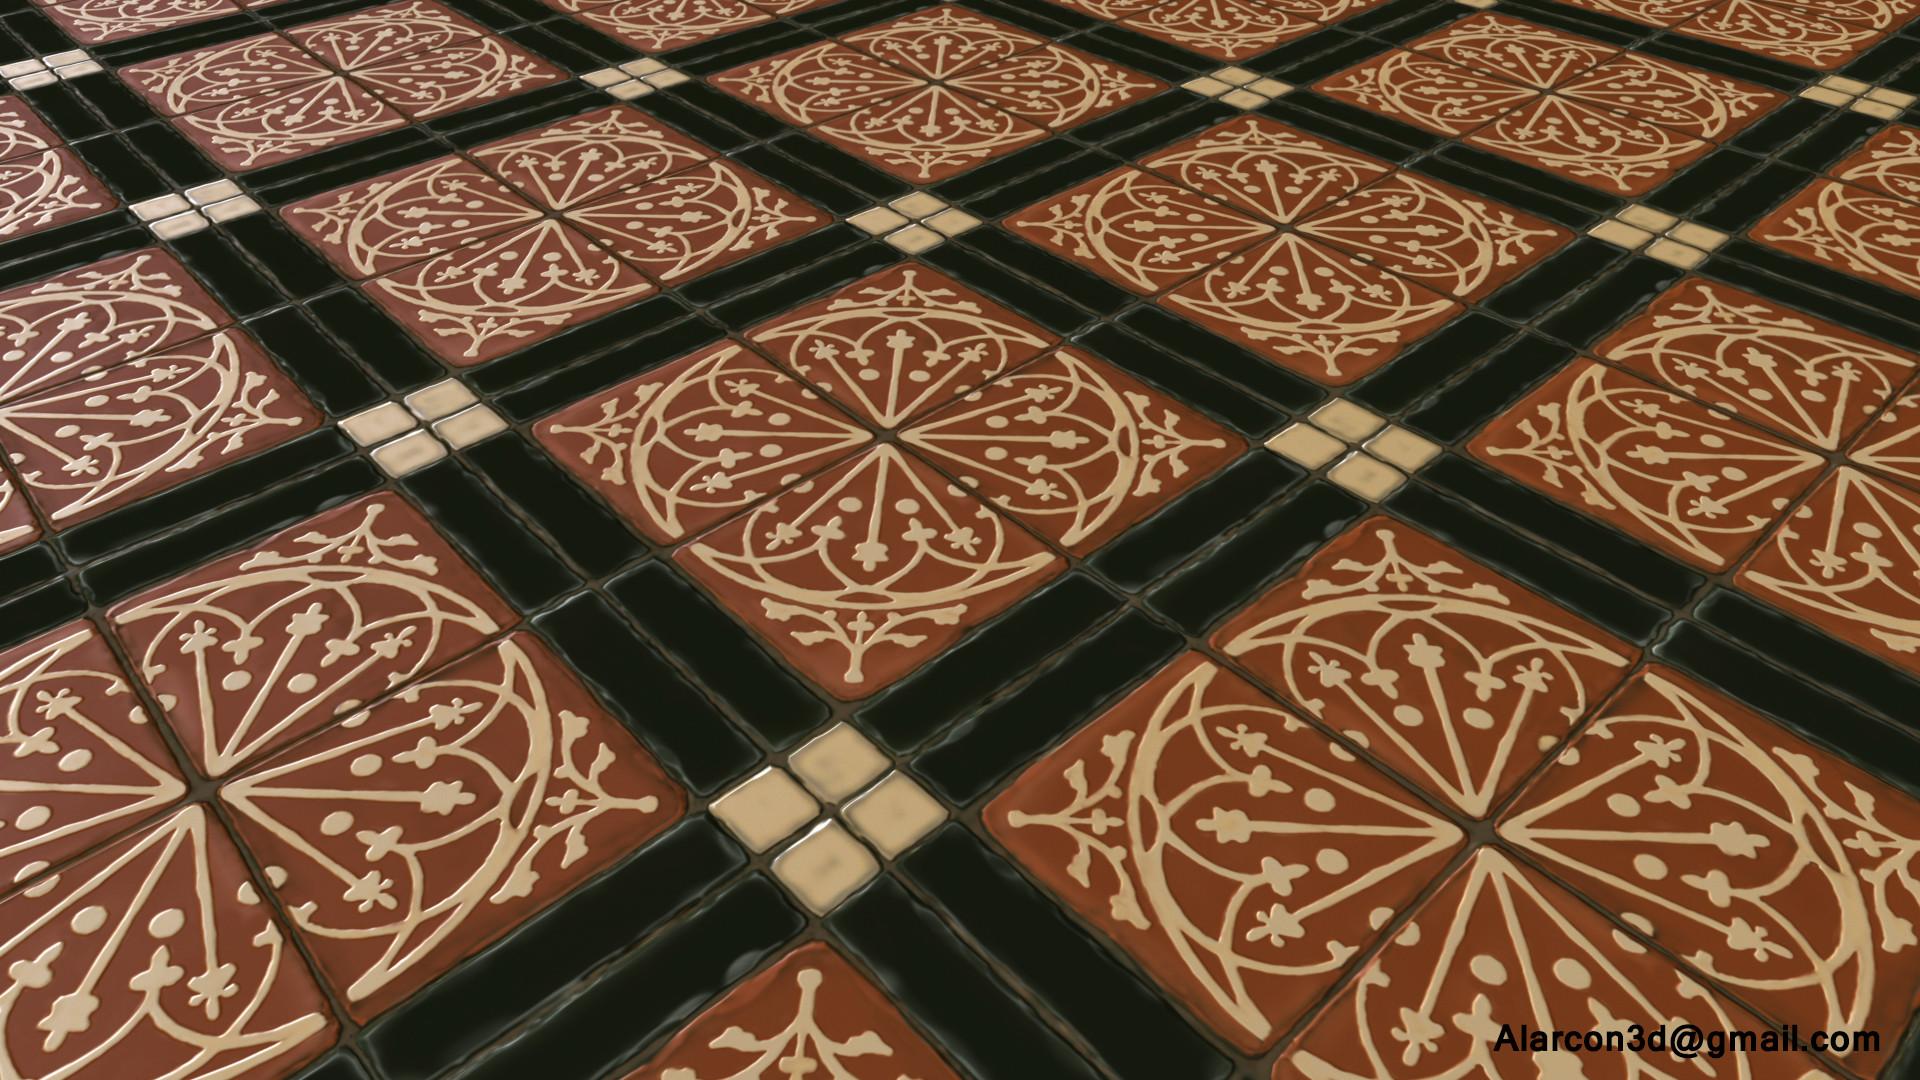 David alarcon motif tile